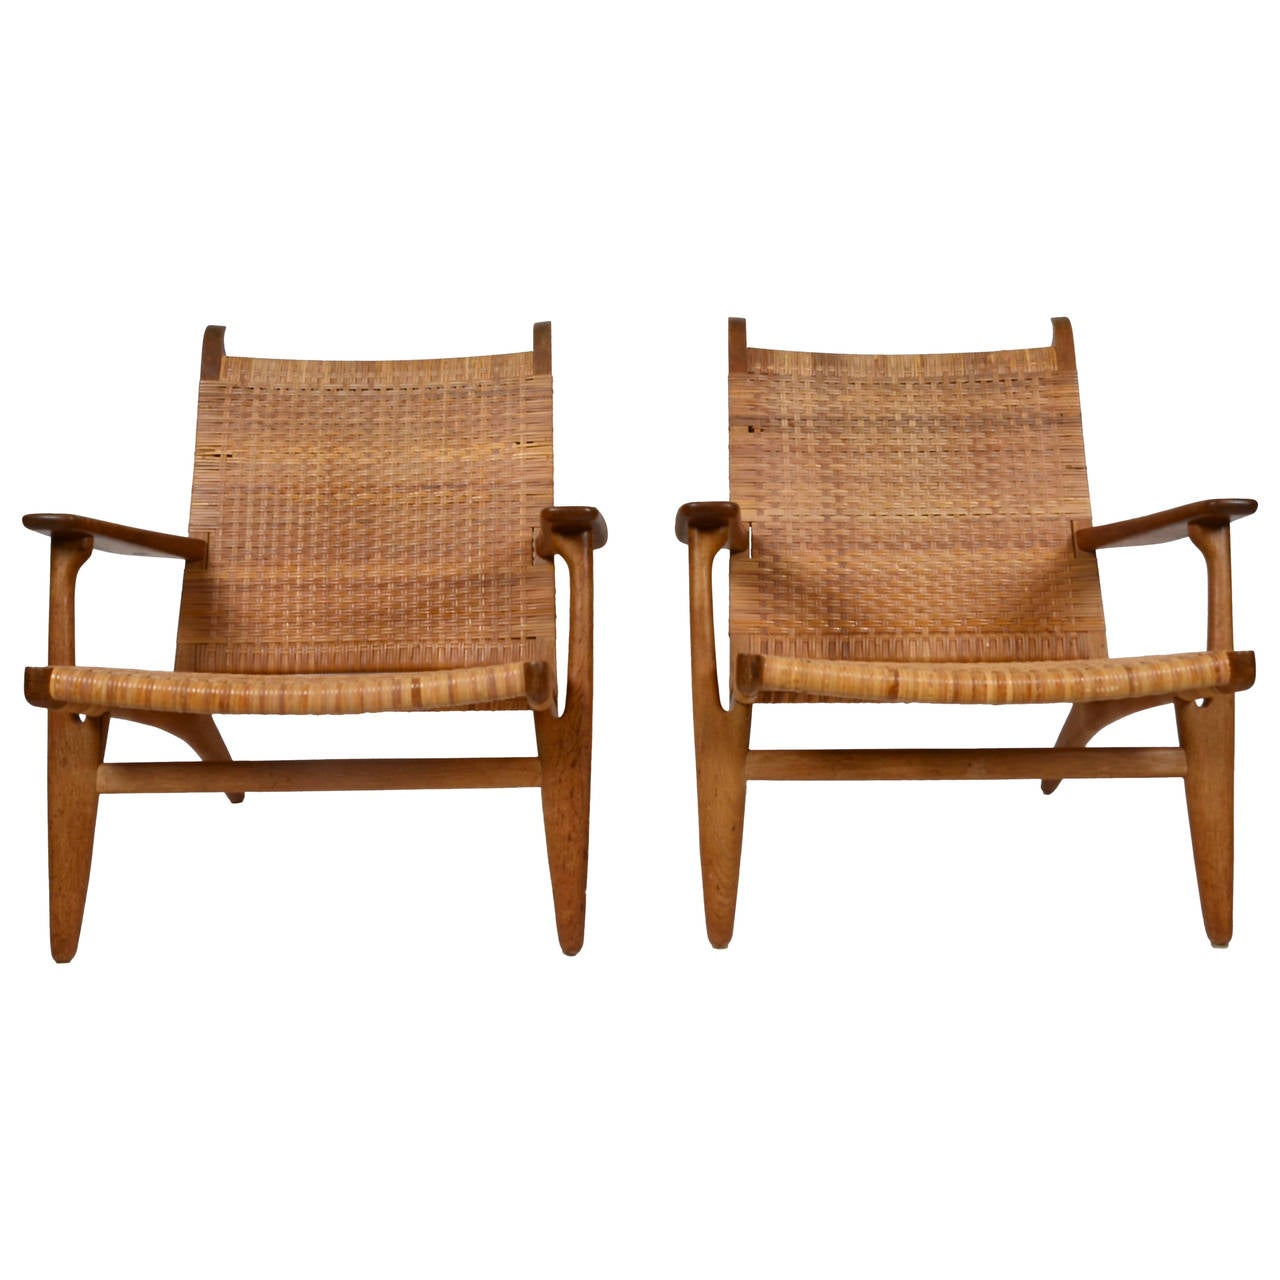 hans j. wegner easy chairs, model ch27, carl hansen and son at 1stdibs